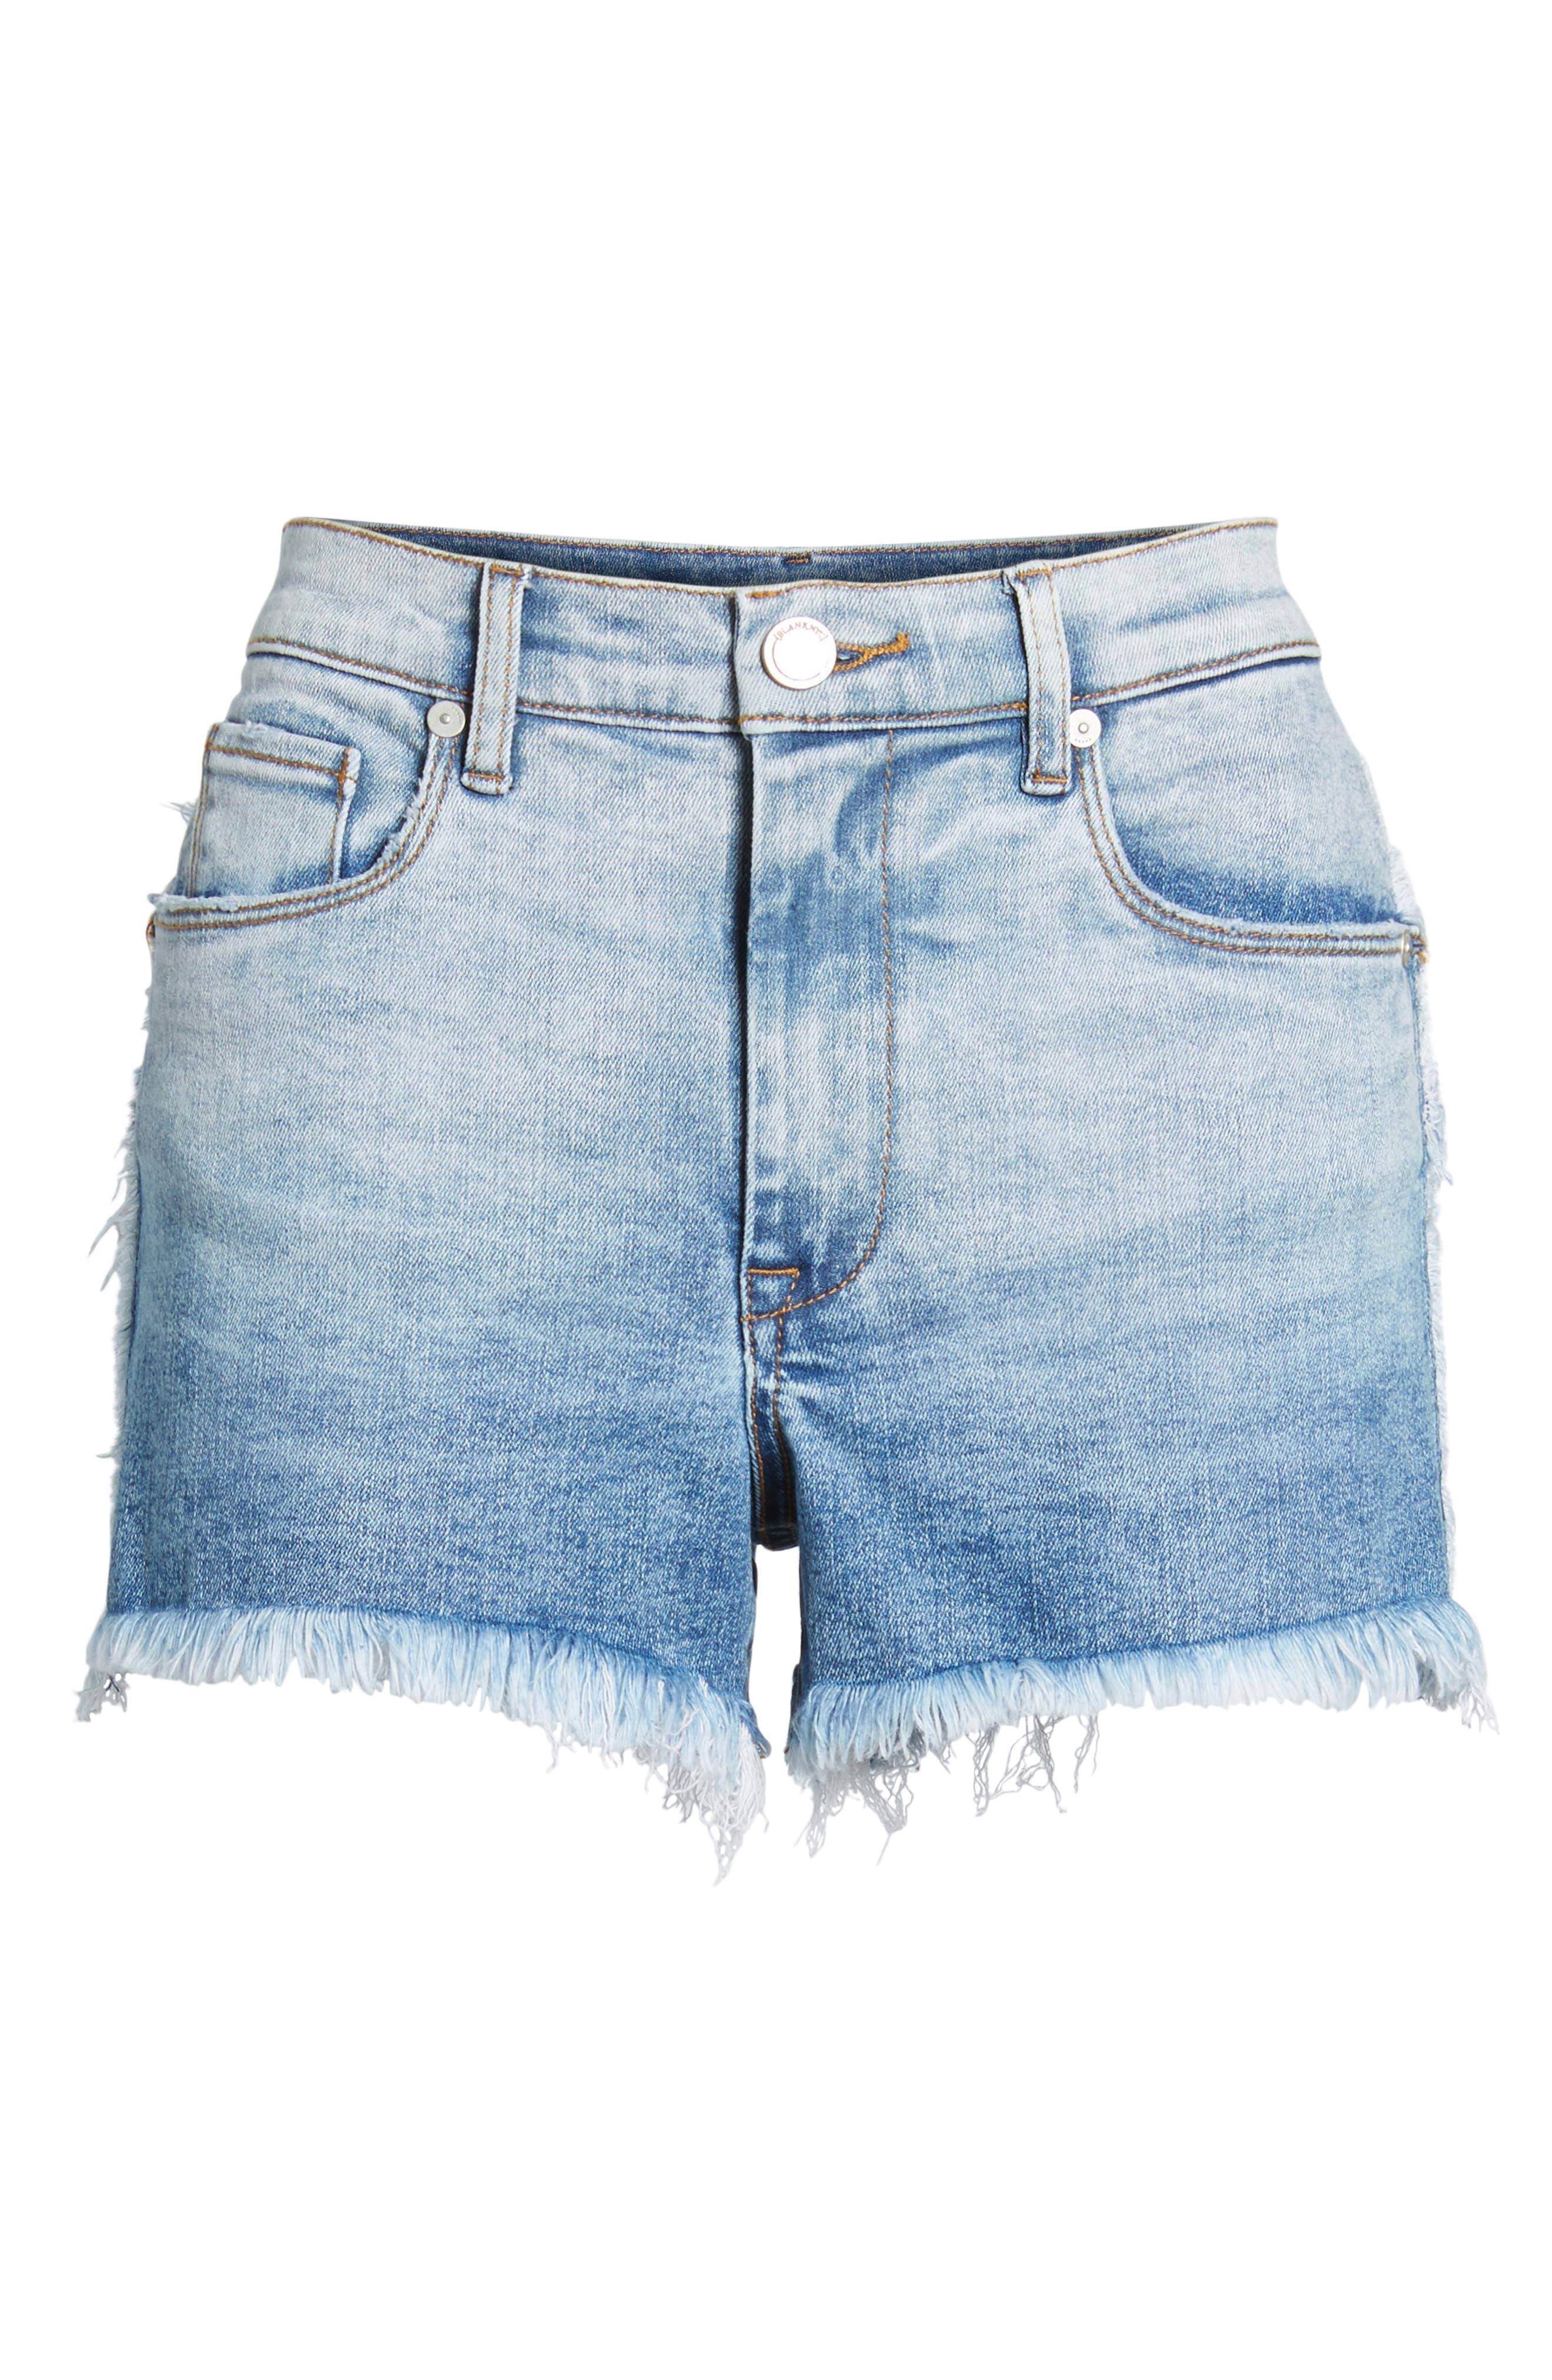 High Waist Cutoff Denim Shorts,                             Alternate thumbnail 7, color,                             Burn Notice